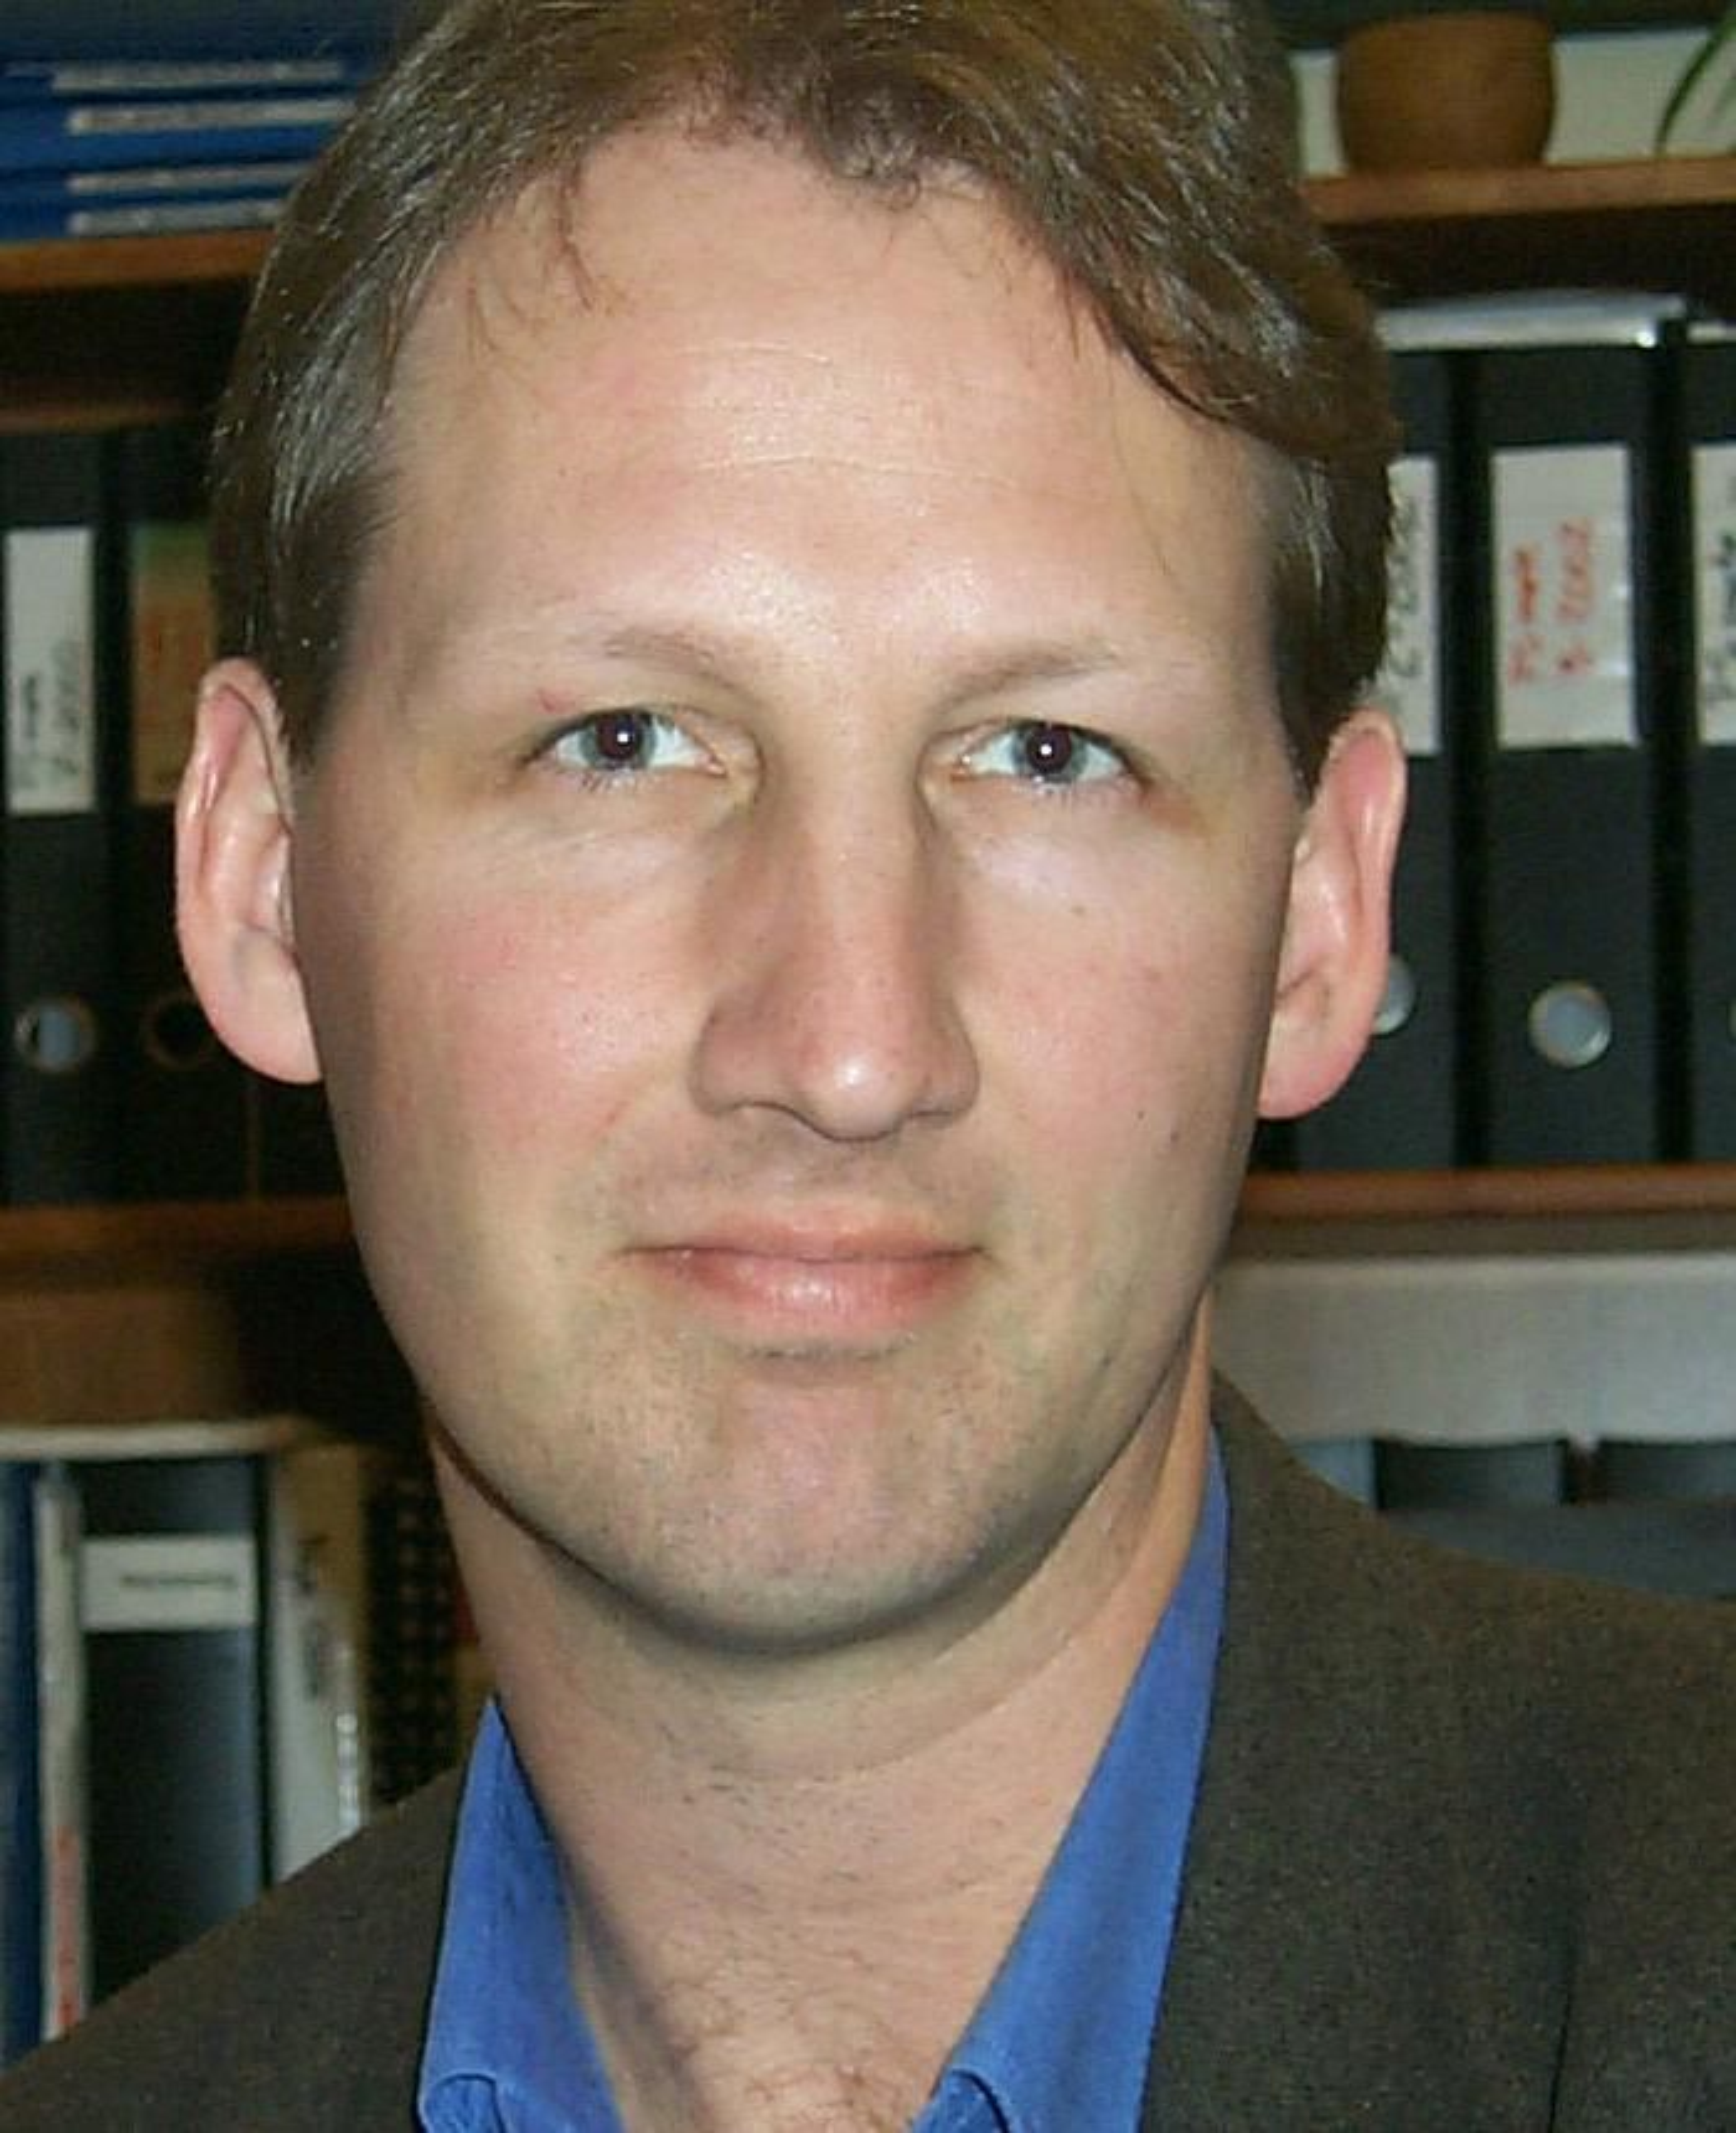 KONTAKTMANN: Gjermund Lanestedt hos Scandpower Information Technology er norsk kontaktmann for eContentplus-programmet.